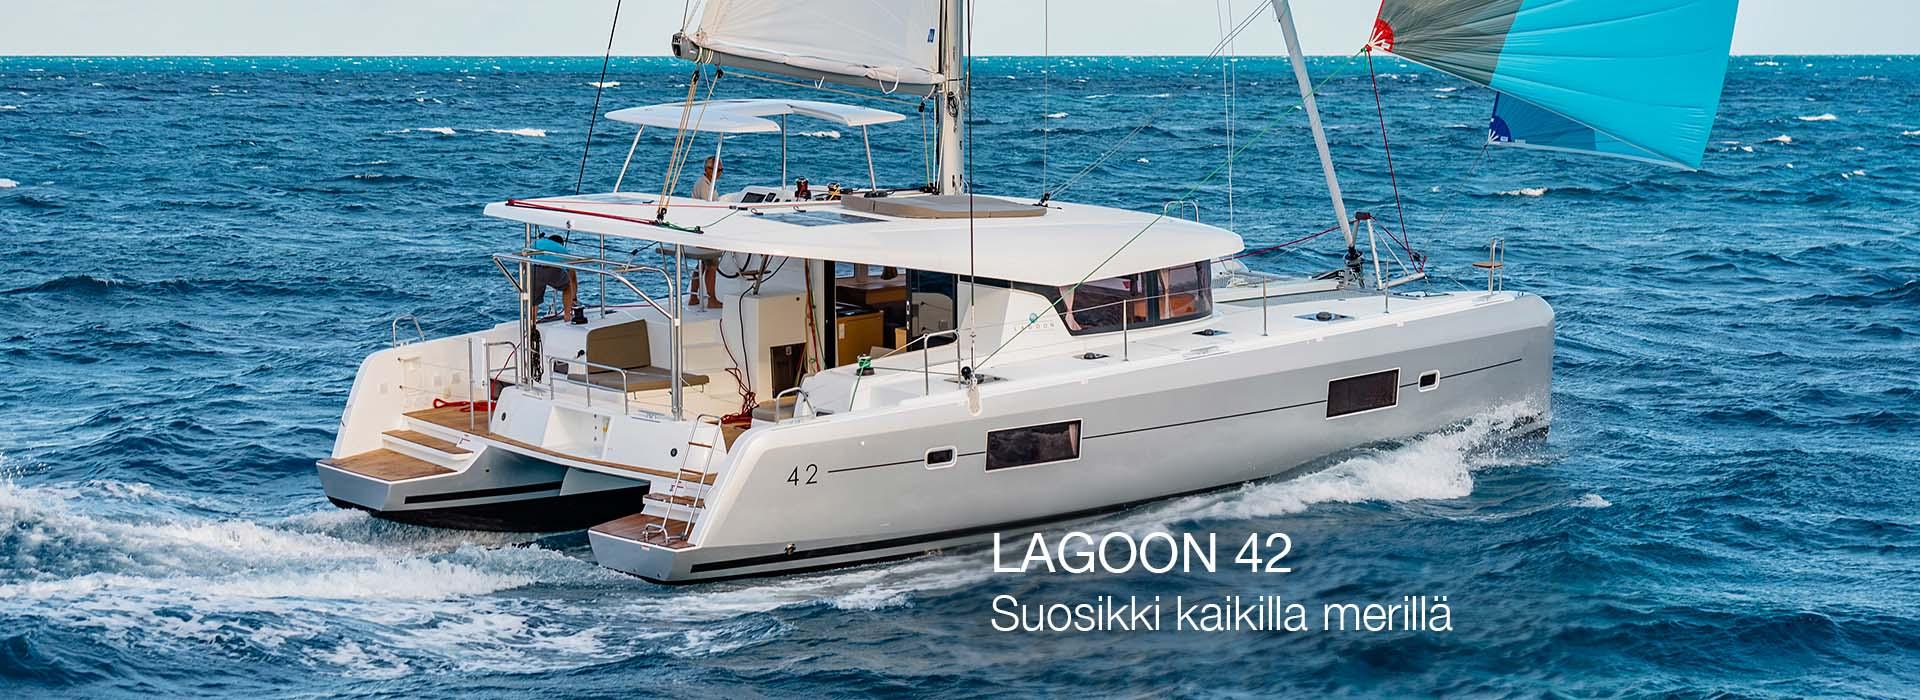 Lagoon 42-txt